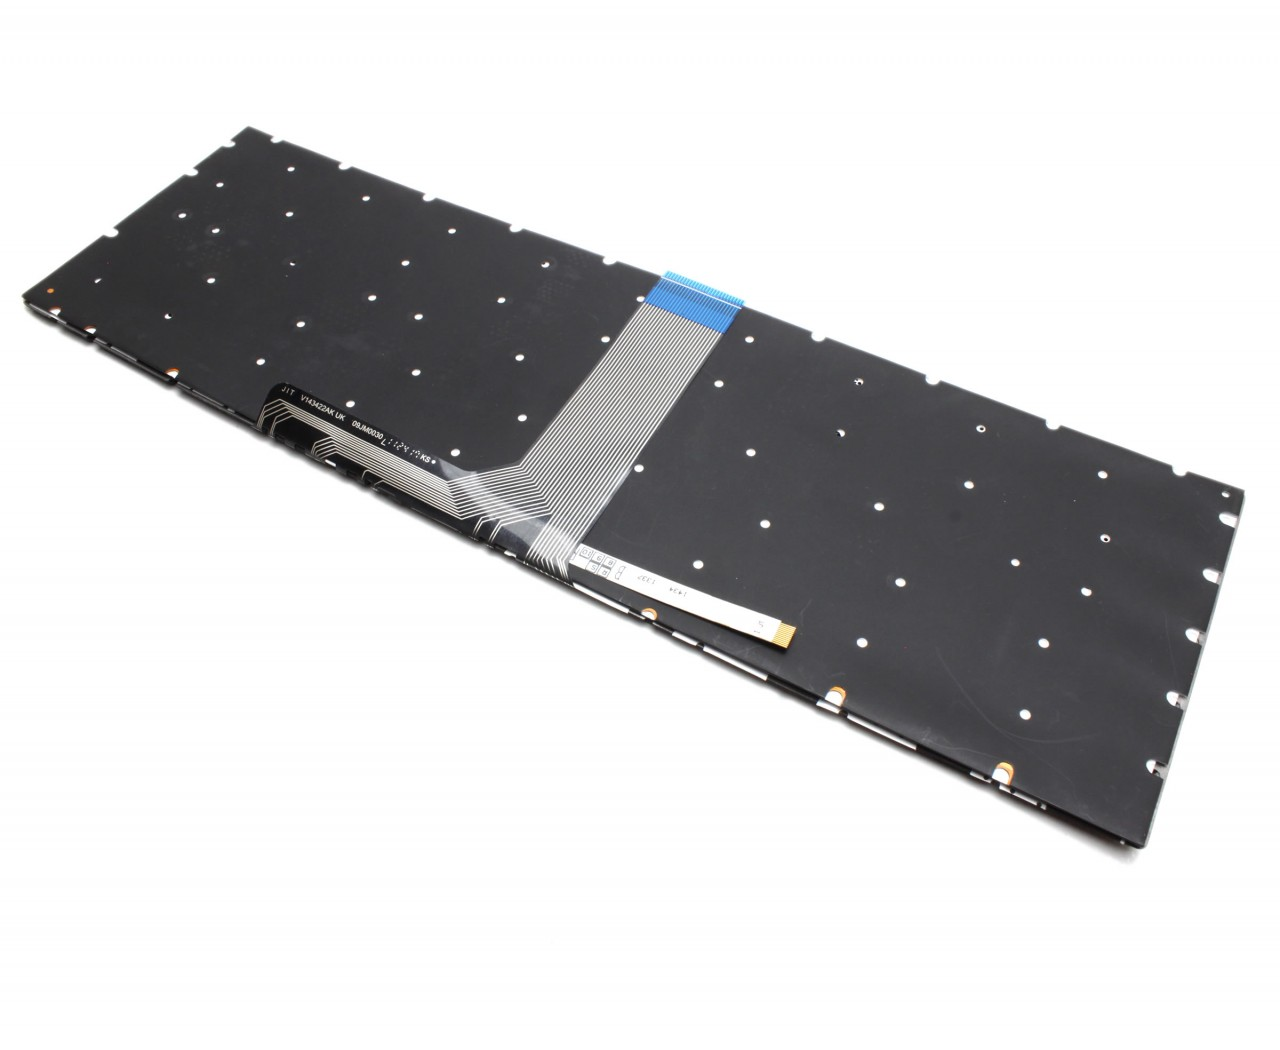 Tastatura MSI WS72 6QJ iluminata backlit imagine powerlaptop.ro 2021